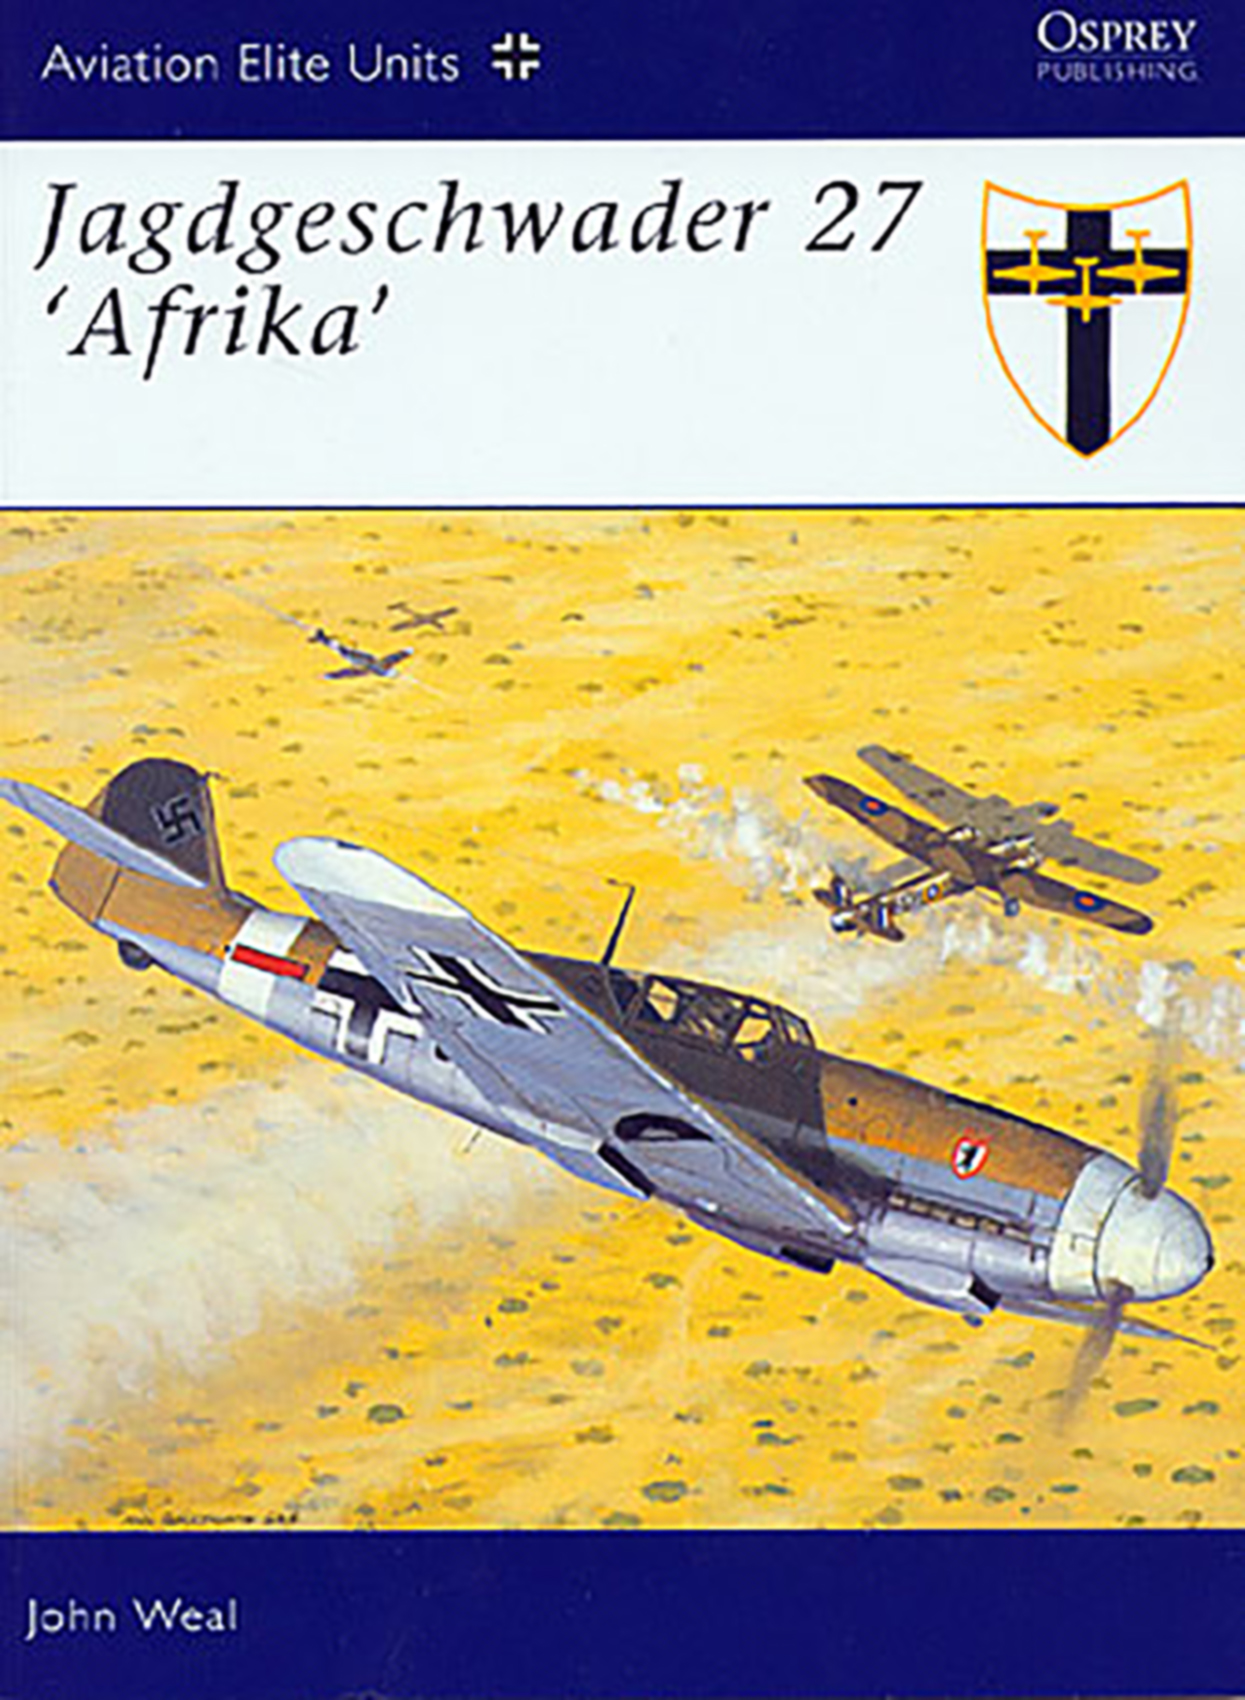 Art Ospreys Aviation Elite Units No 12 Jagdgeschwader 27 Afrika 0A